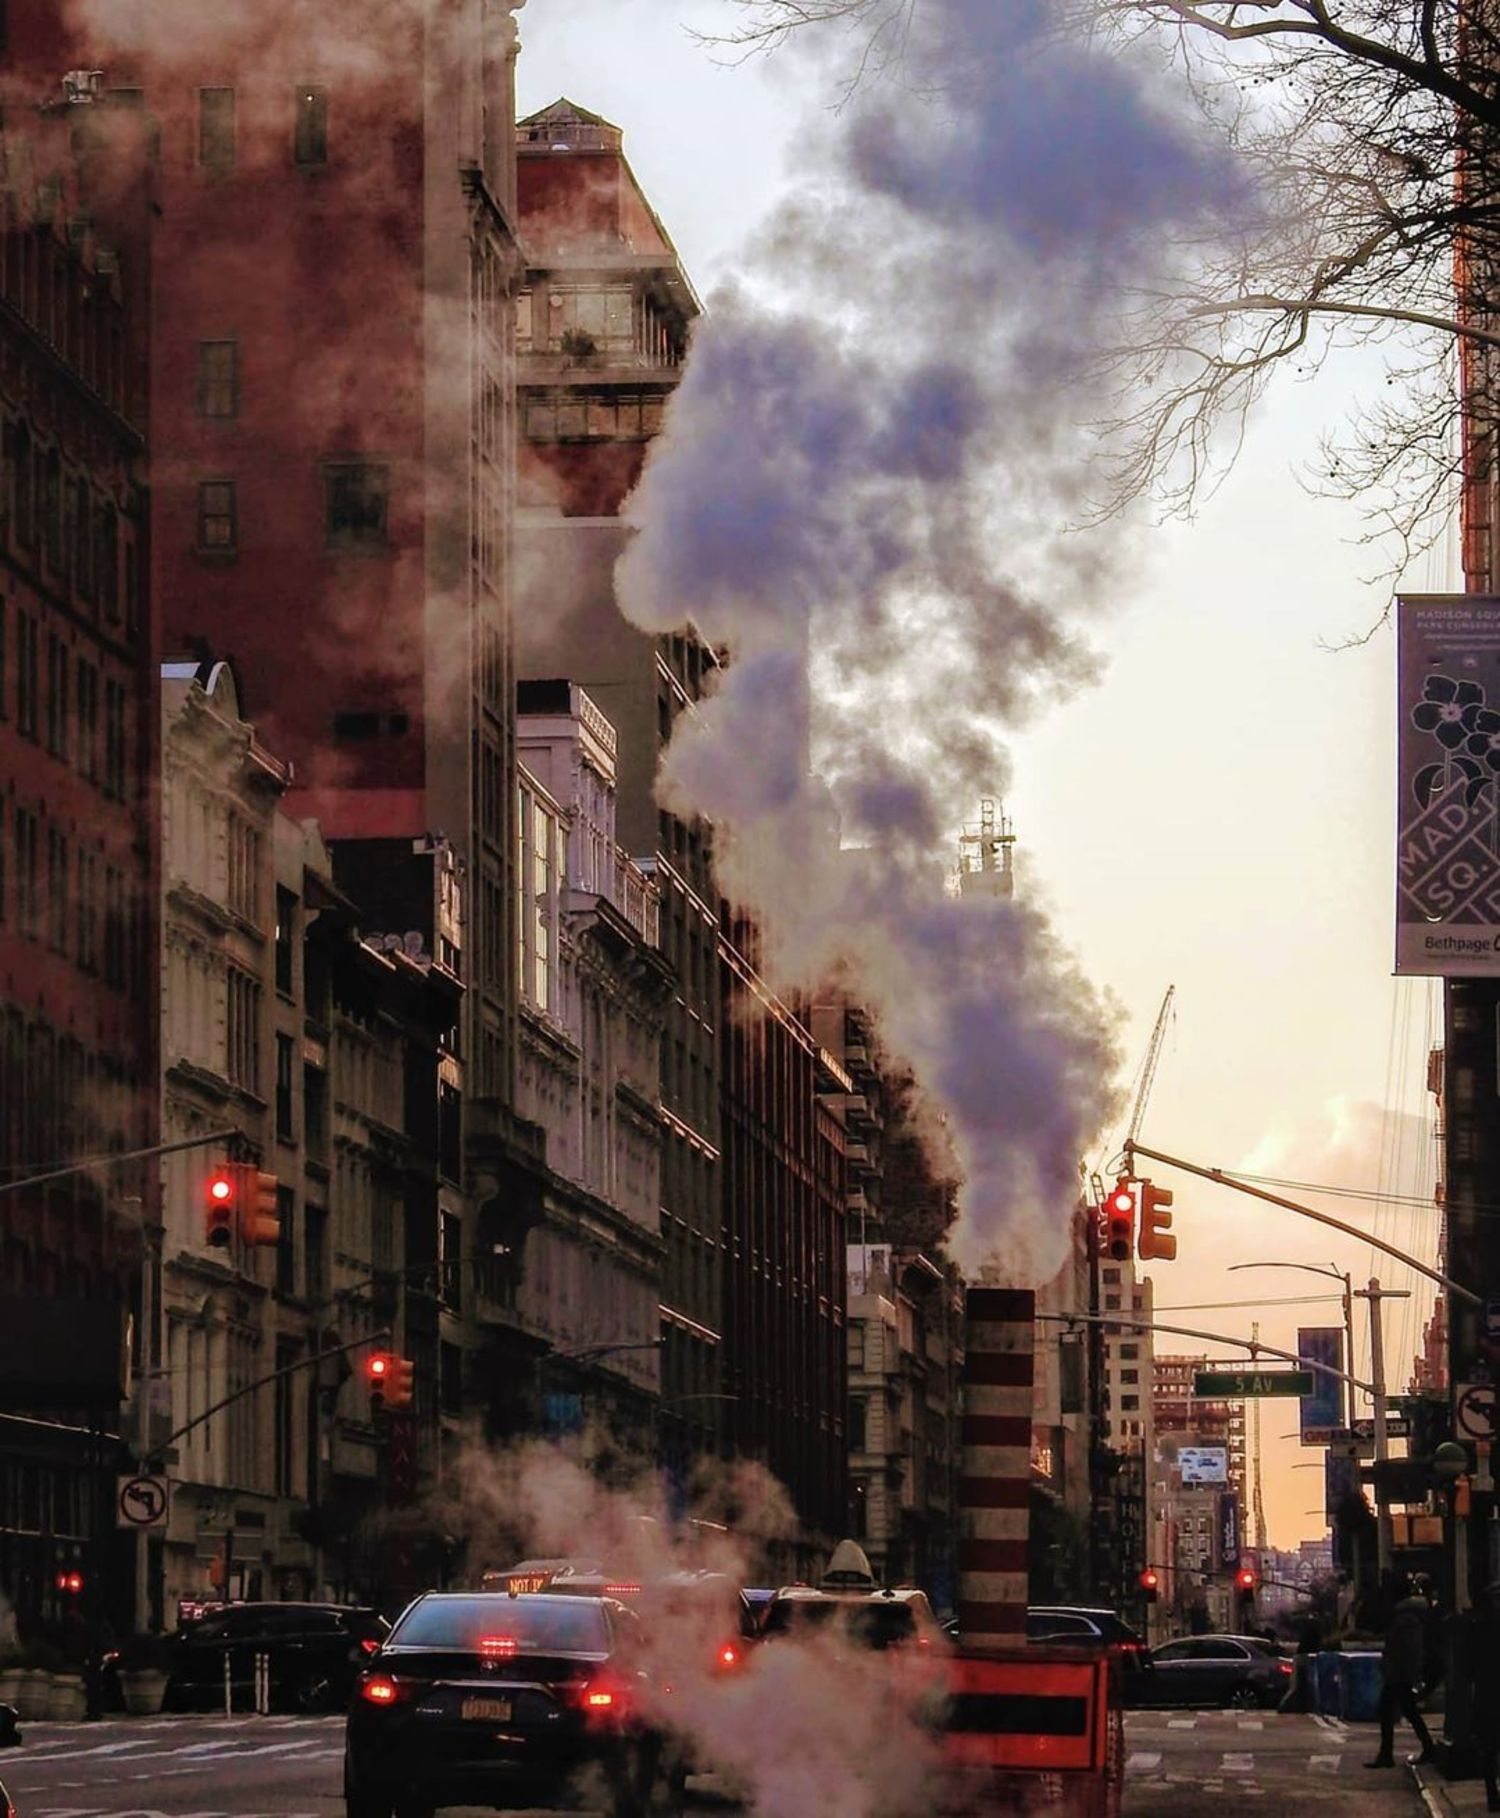 5th Avenue and 23rd Street, Flatiron District, Manhattan